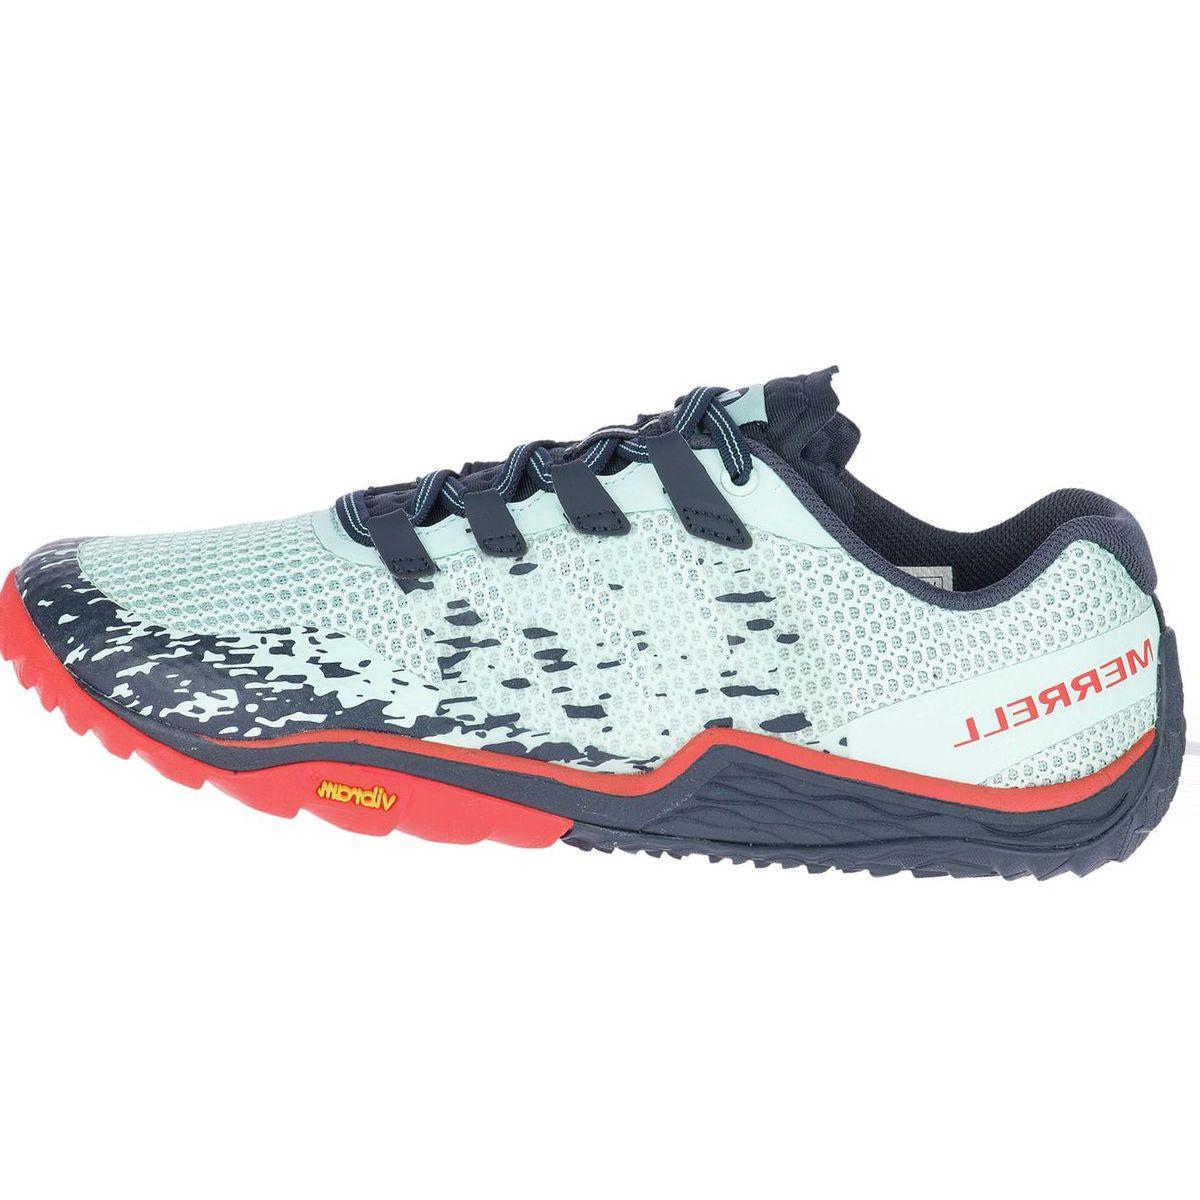 Merrell Trail Glove 5 Running Shoe - Women's